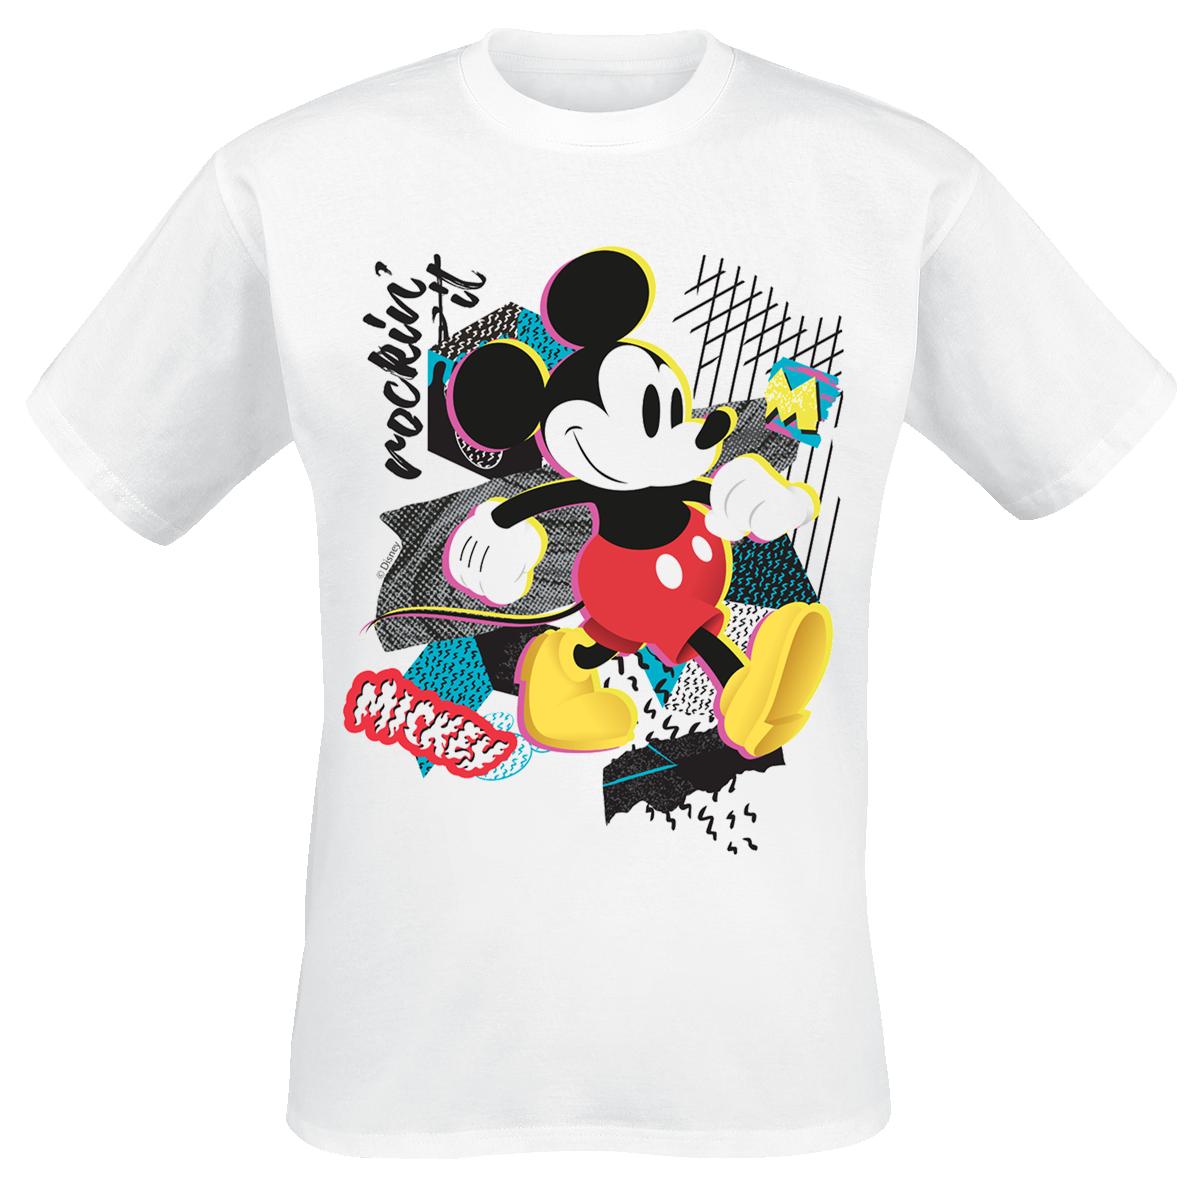 Mickey Mouse - Mickey Rockin' It - T-Shirt - white image